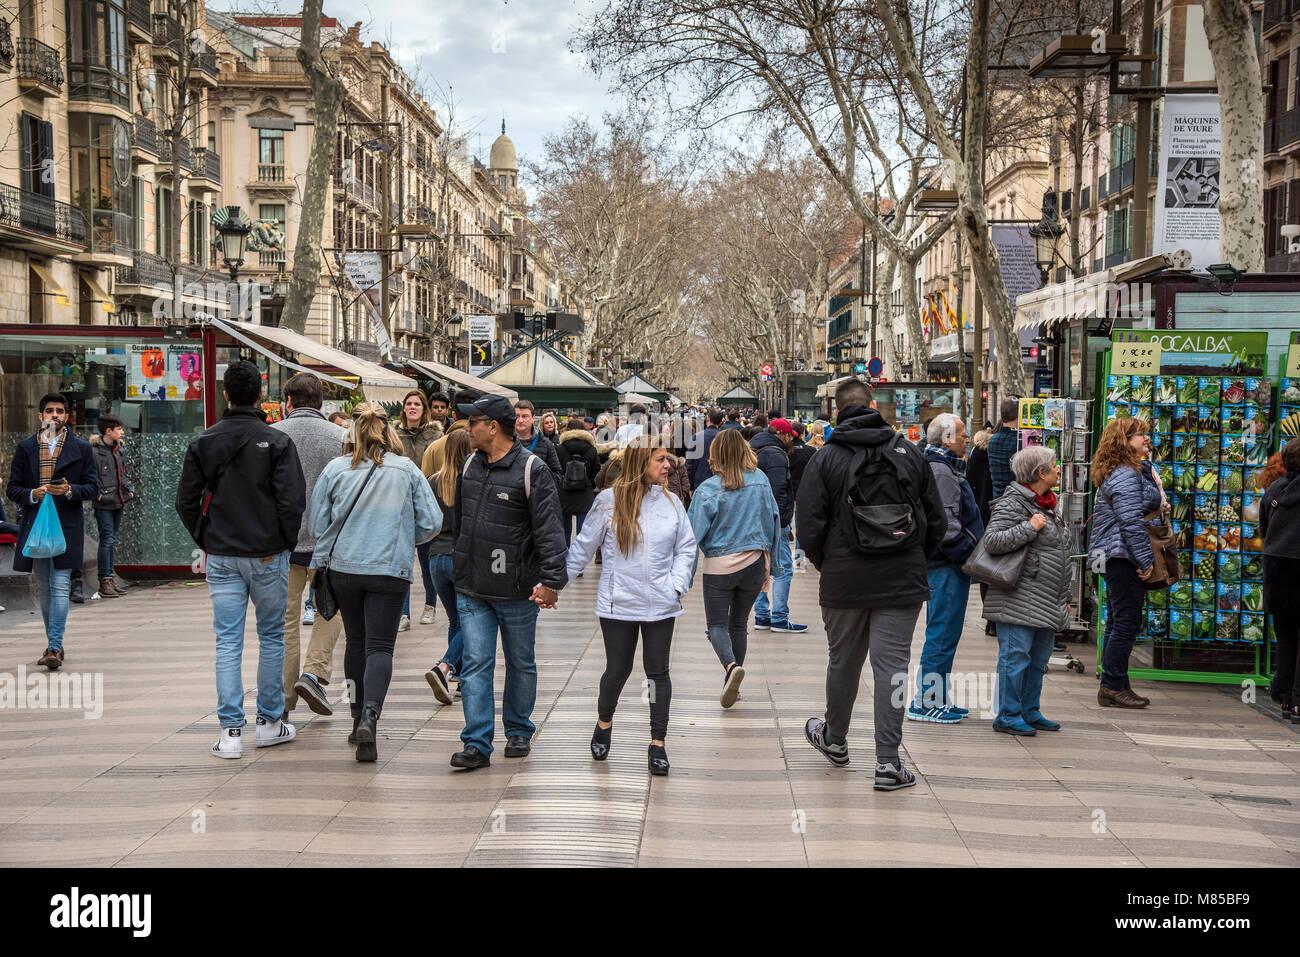 Tourists walking in the famous Rambla pedestrian mall, Barcelona, Catalonia, Spain - Stock Image